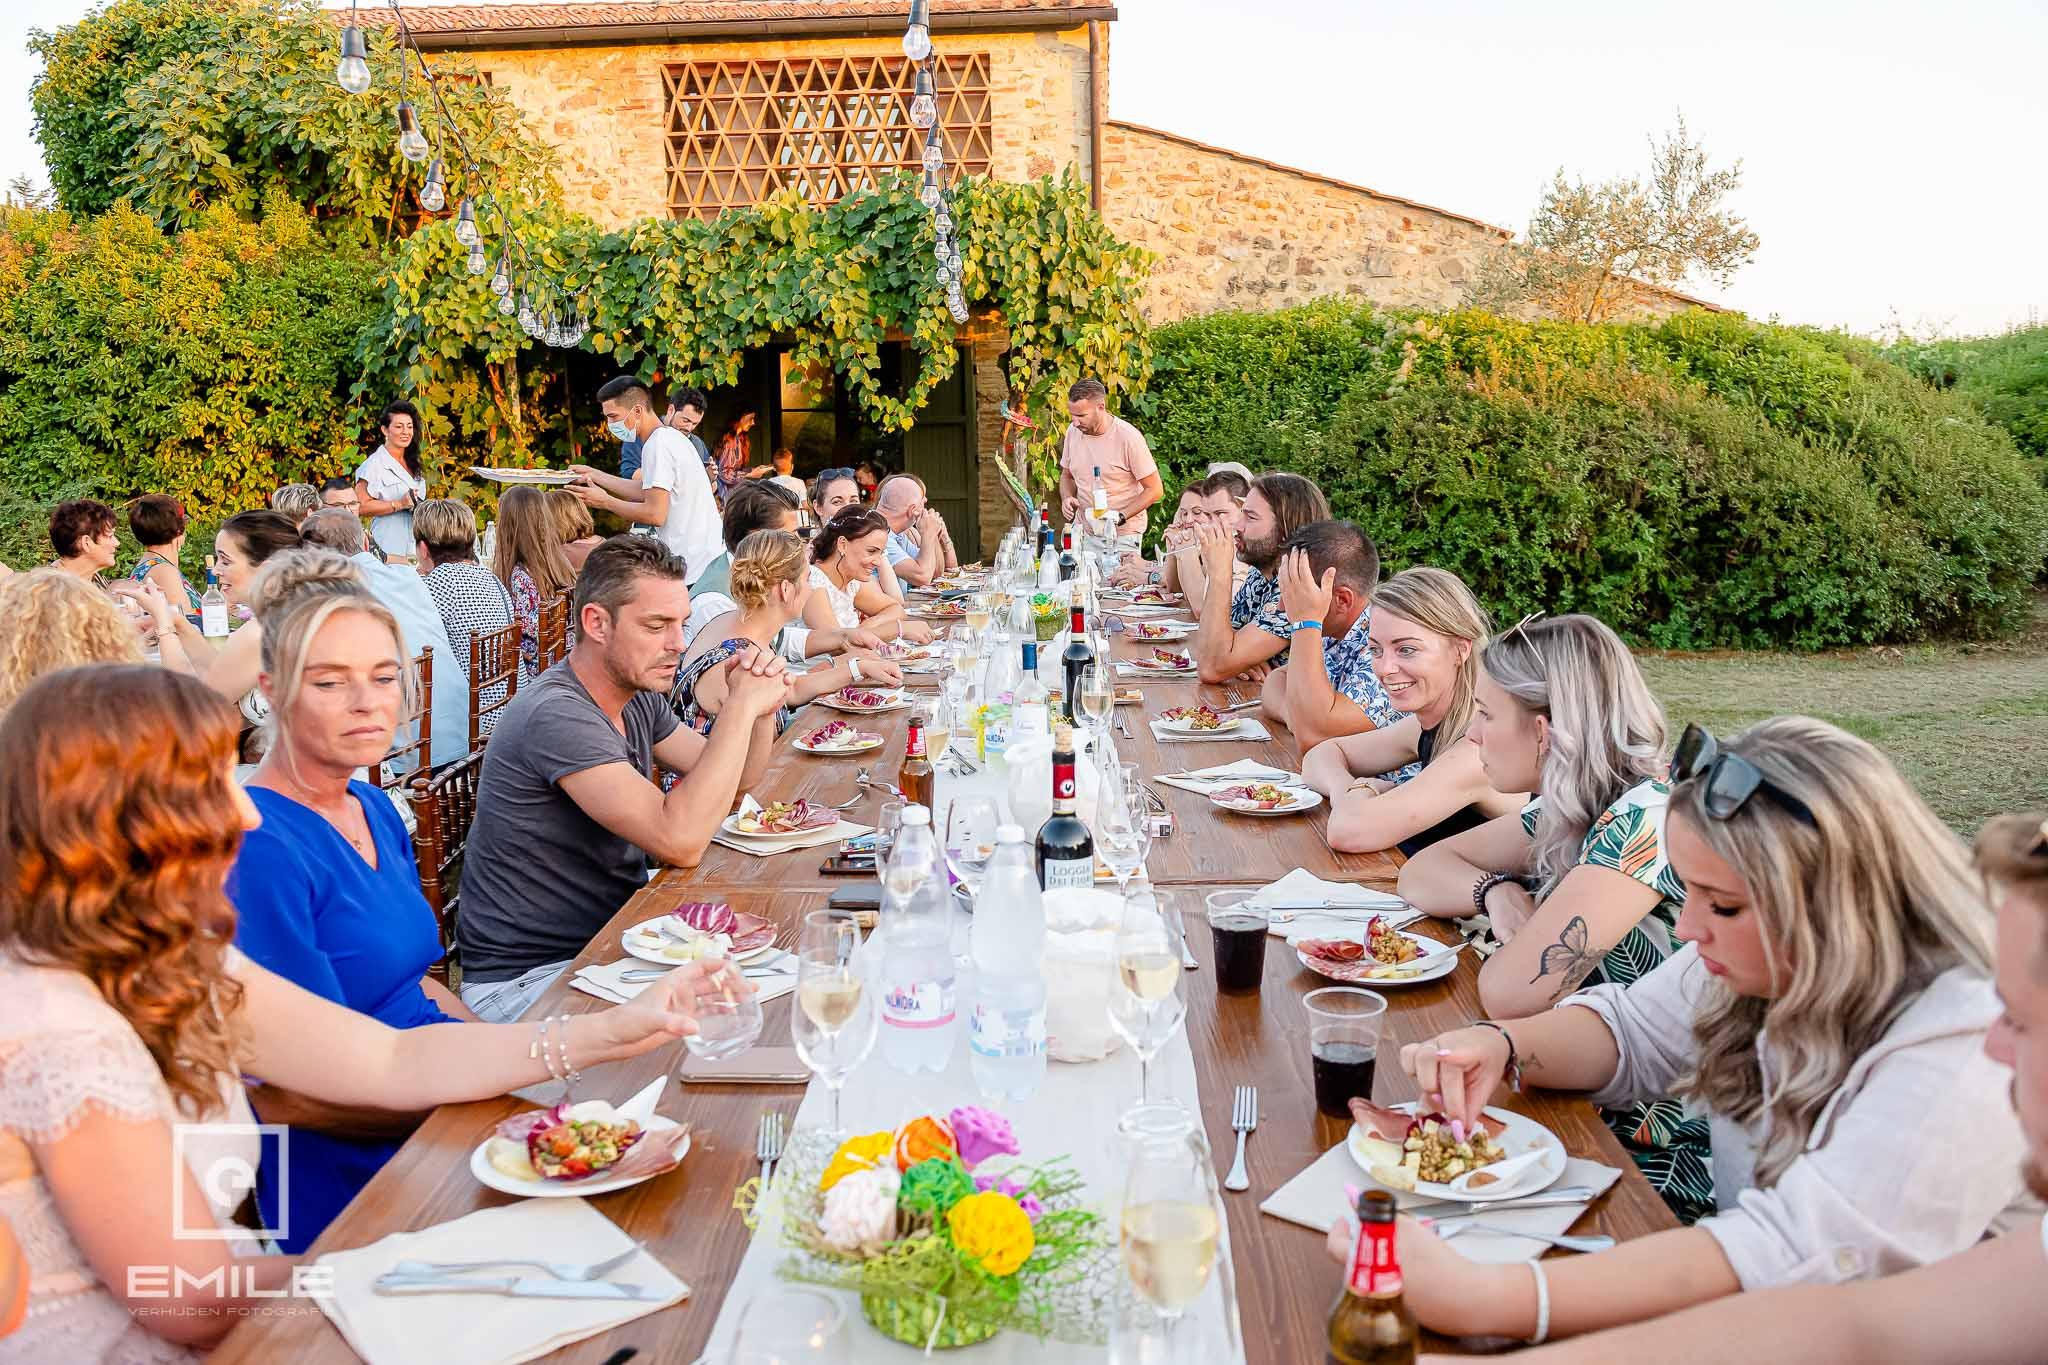 Iedereen aan tafel ! - Destination wedding San Gimignano - Toscane Italie - Iris en Job